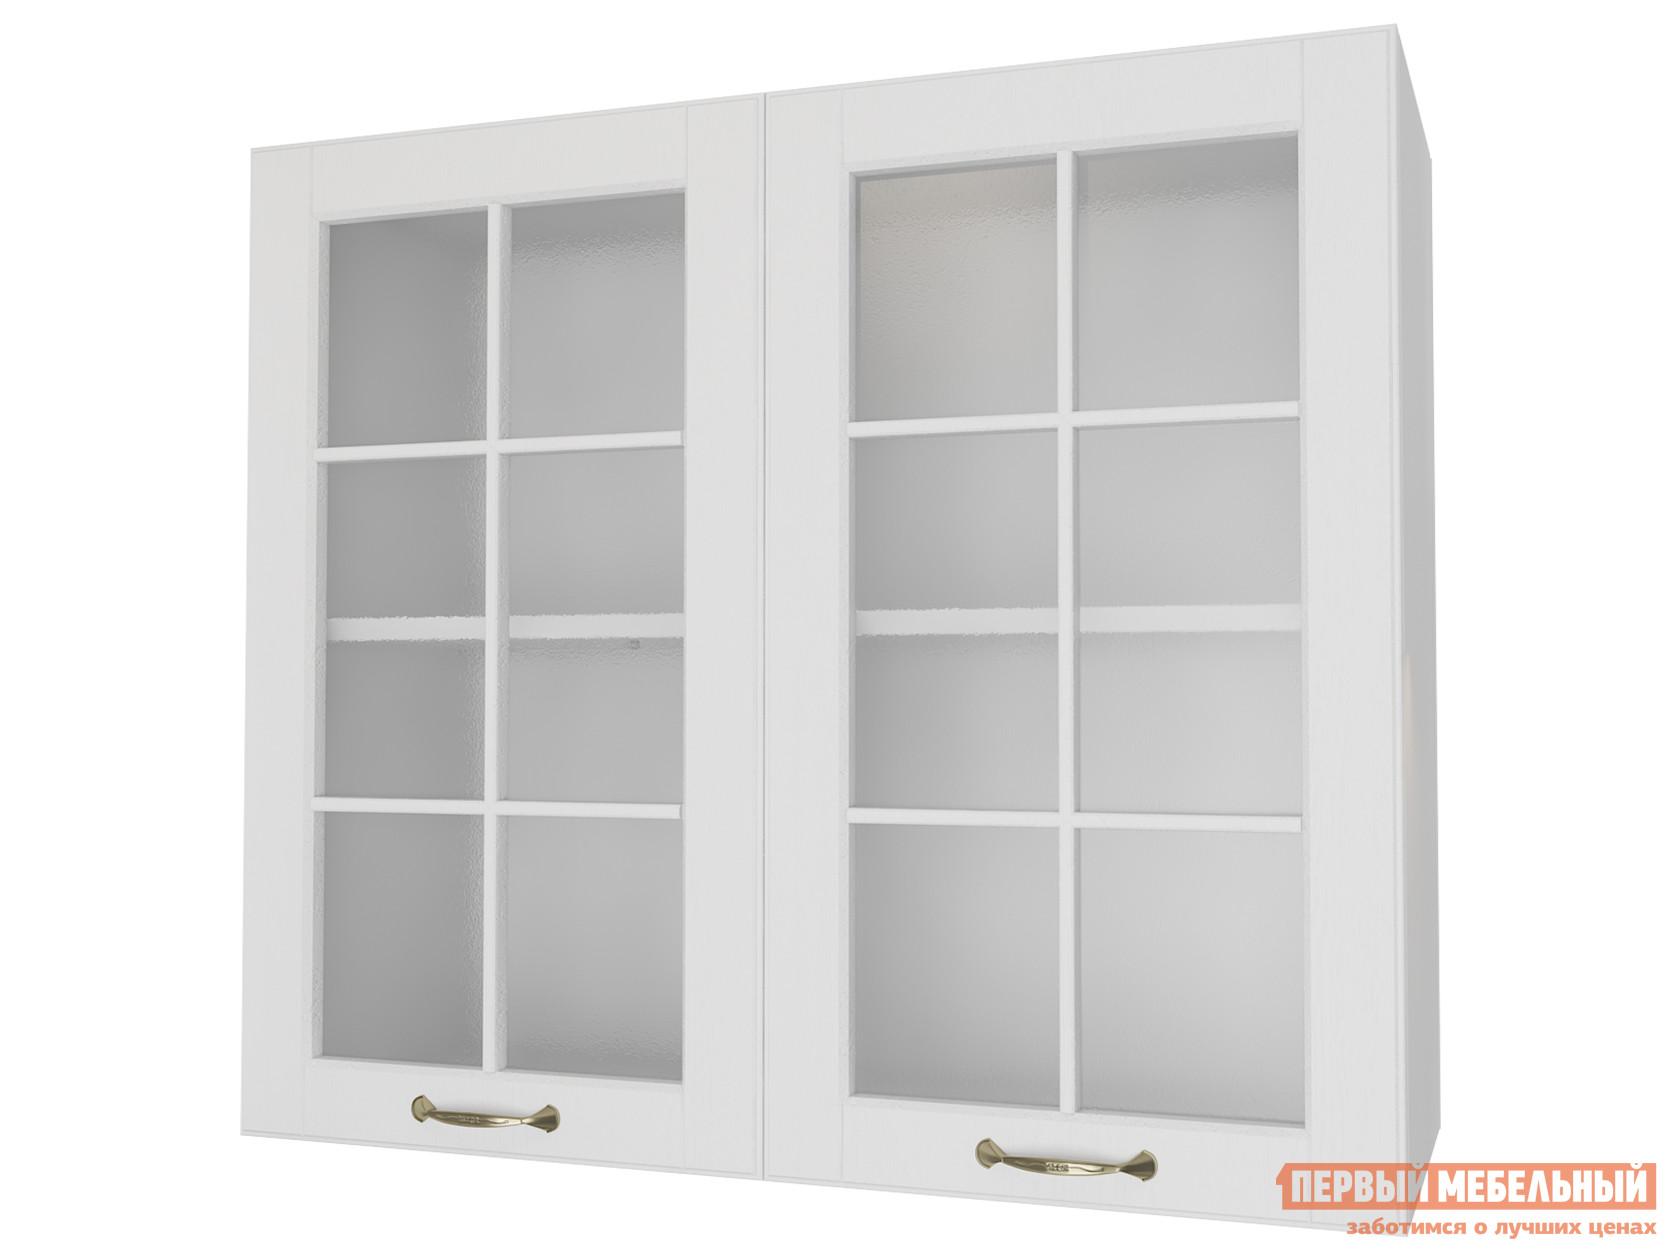 Кухонный модуль  Шкаф 2 двери со стеклом 80 см Палермо Бианко РДМ 84039